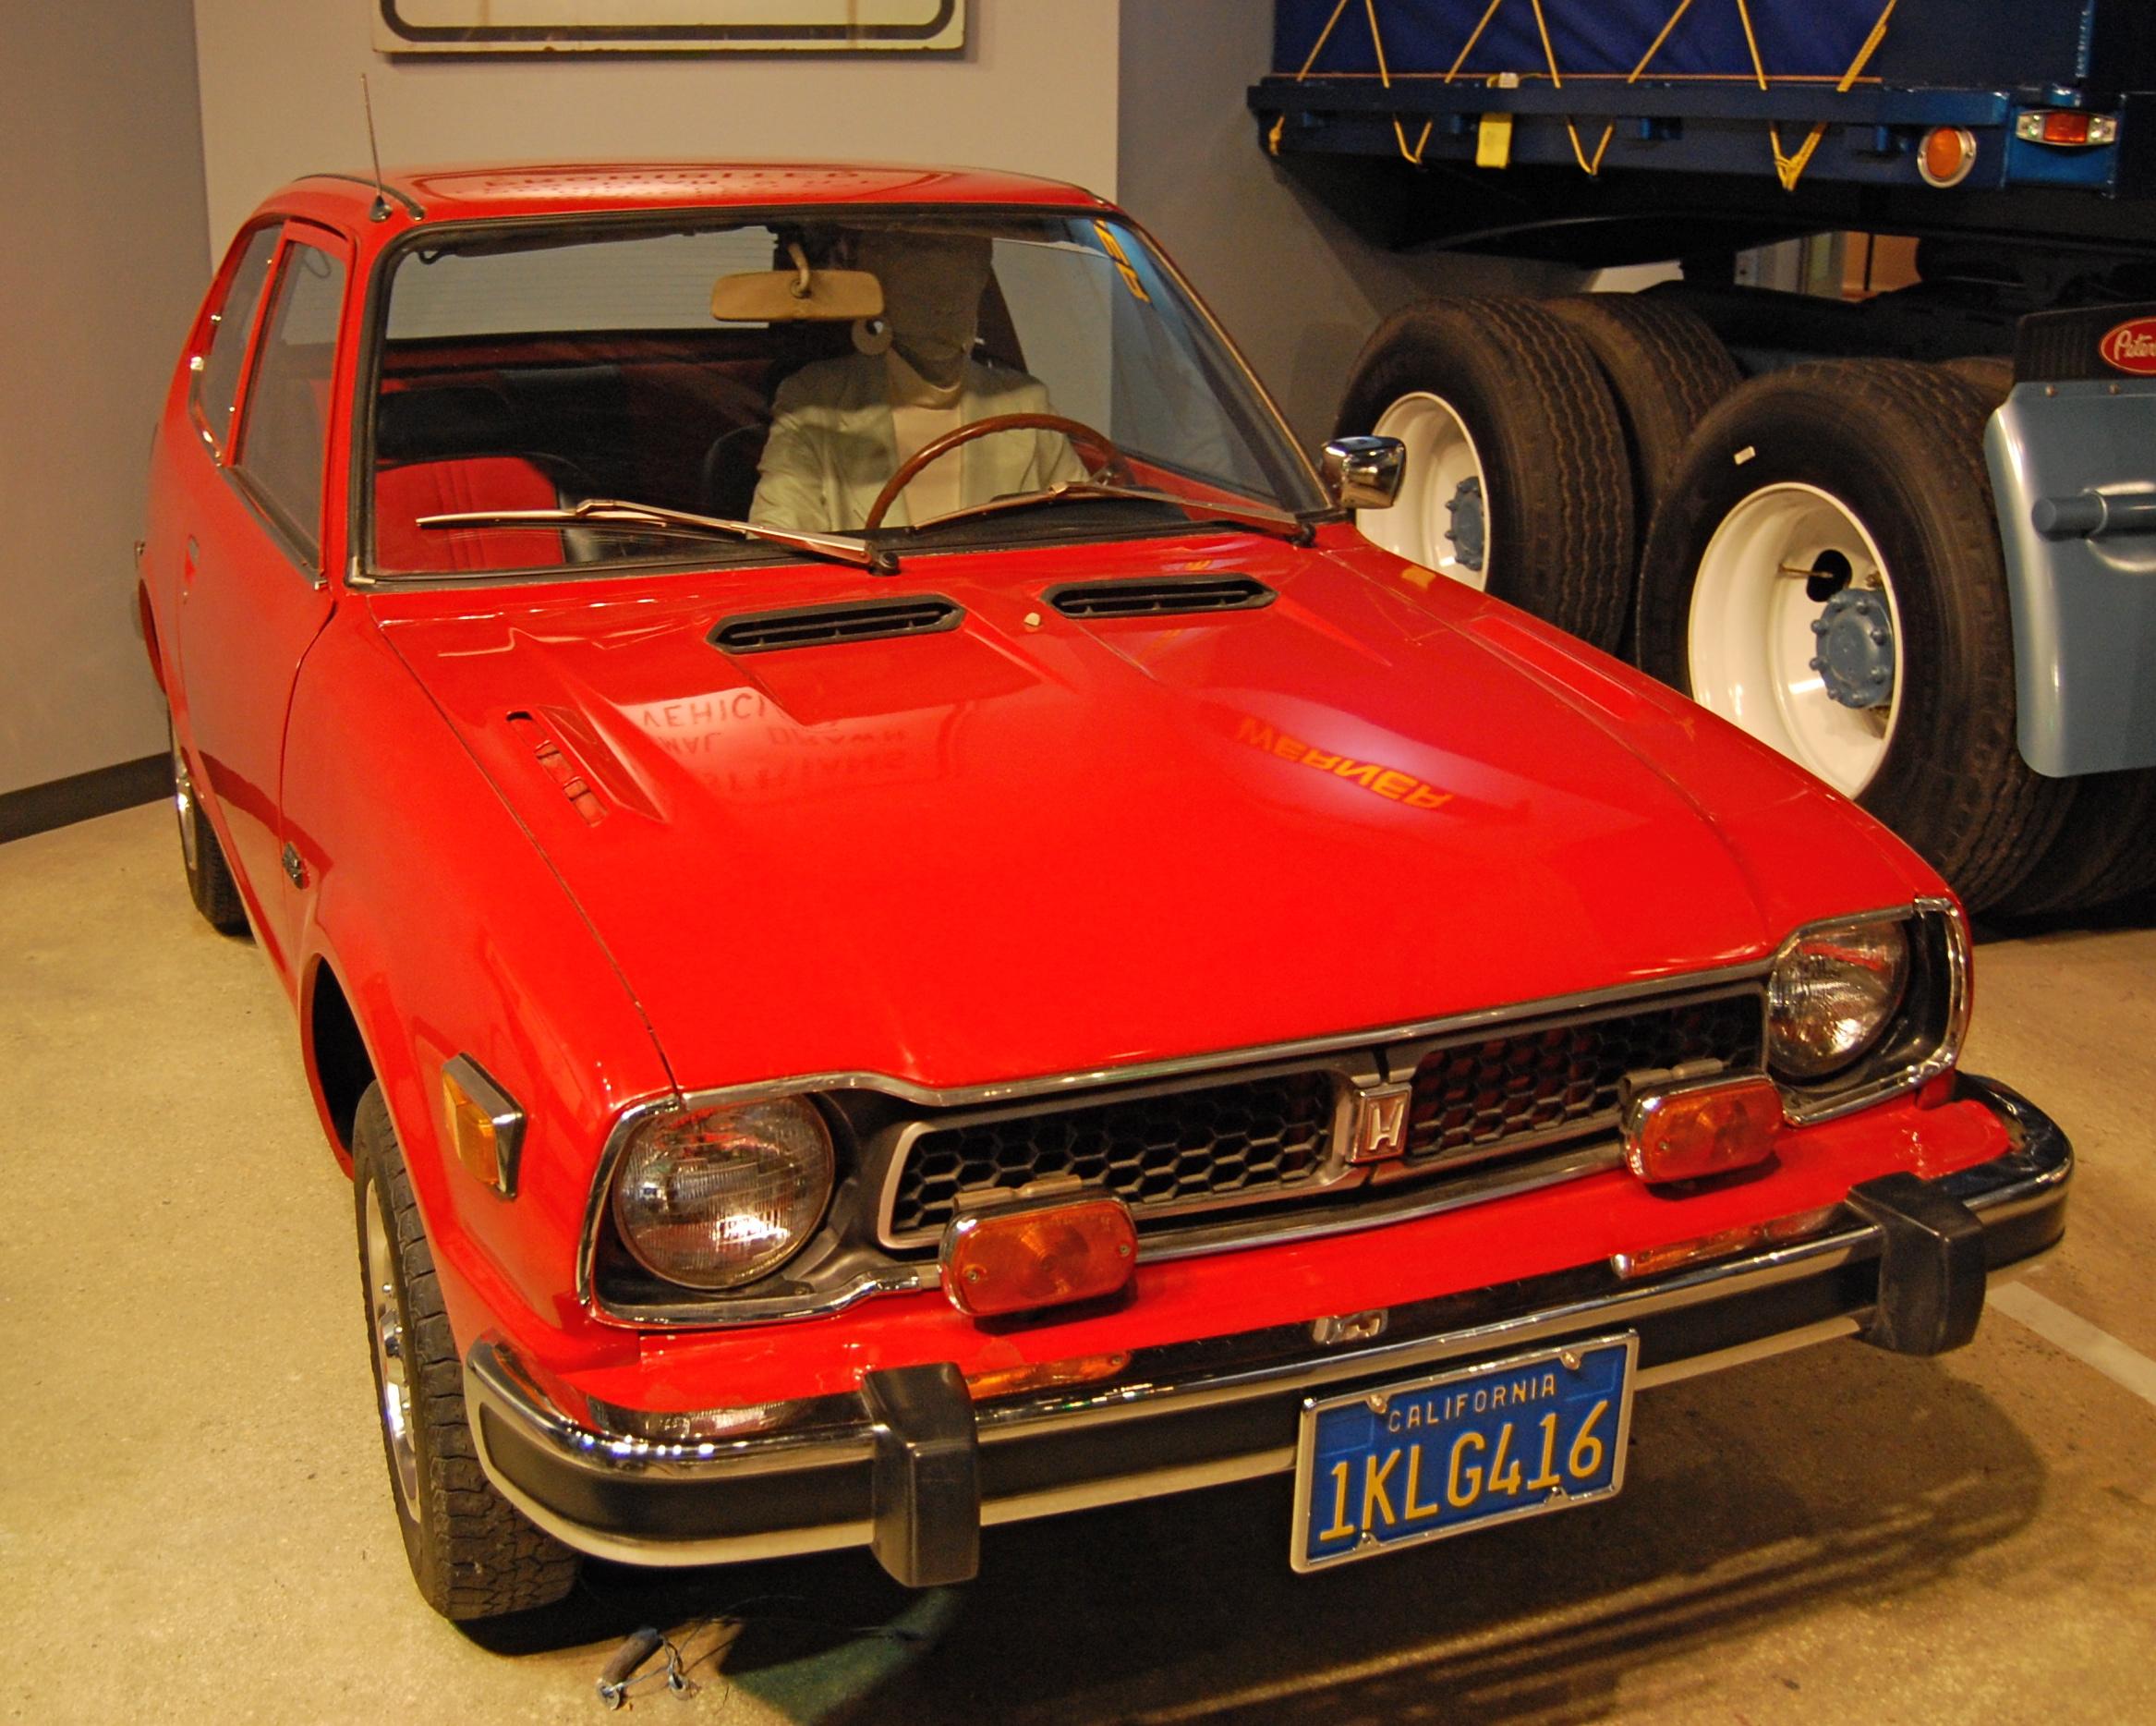 File:1977 Honda Civic.JPG - Wikimedia Commons